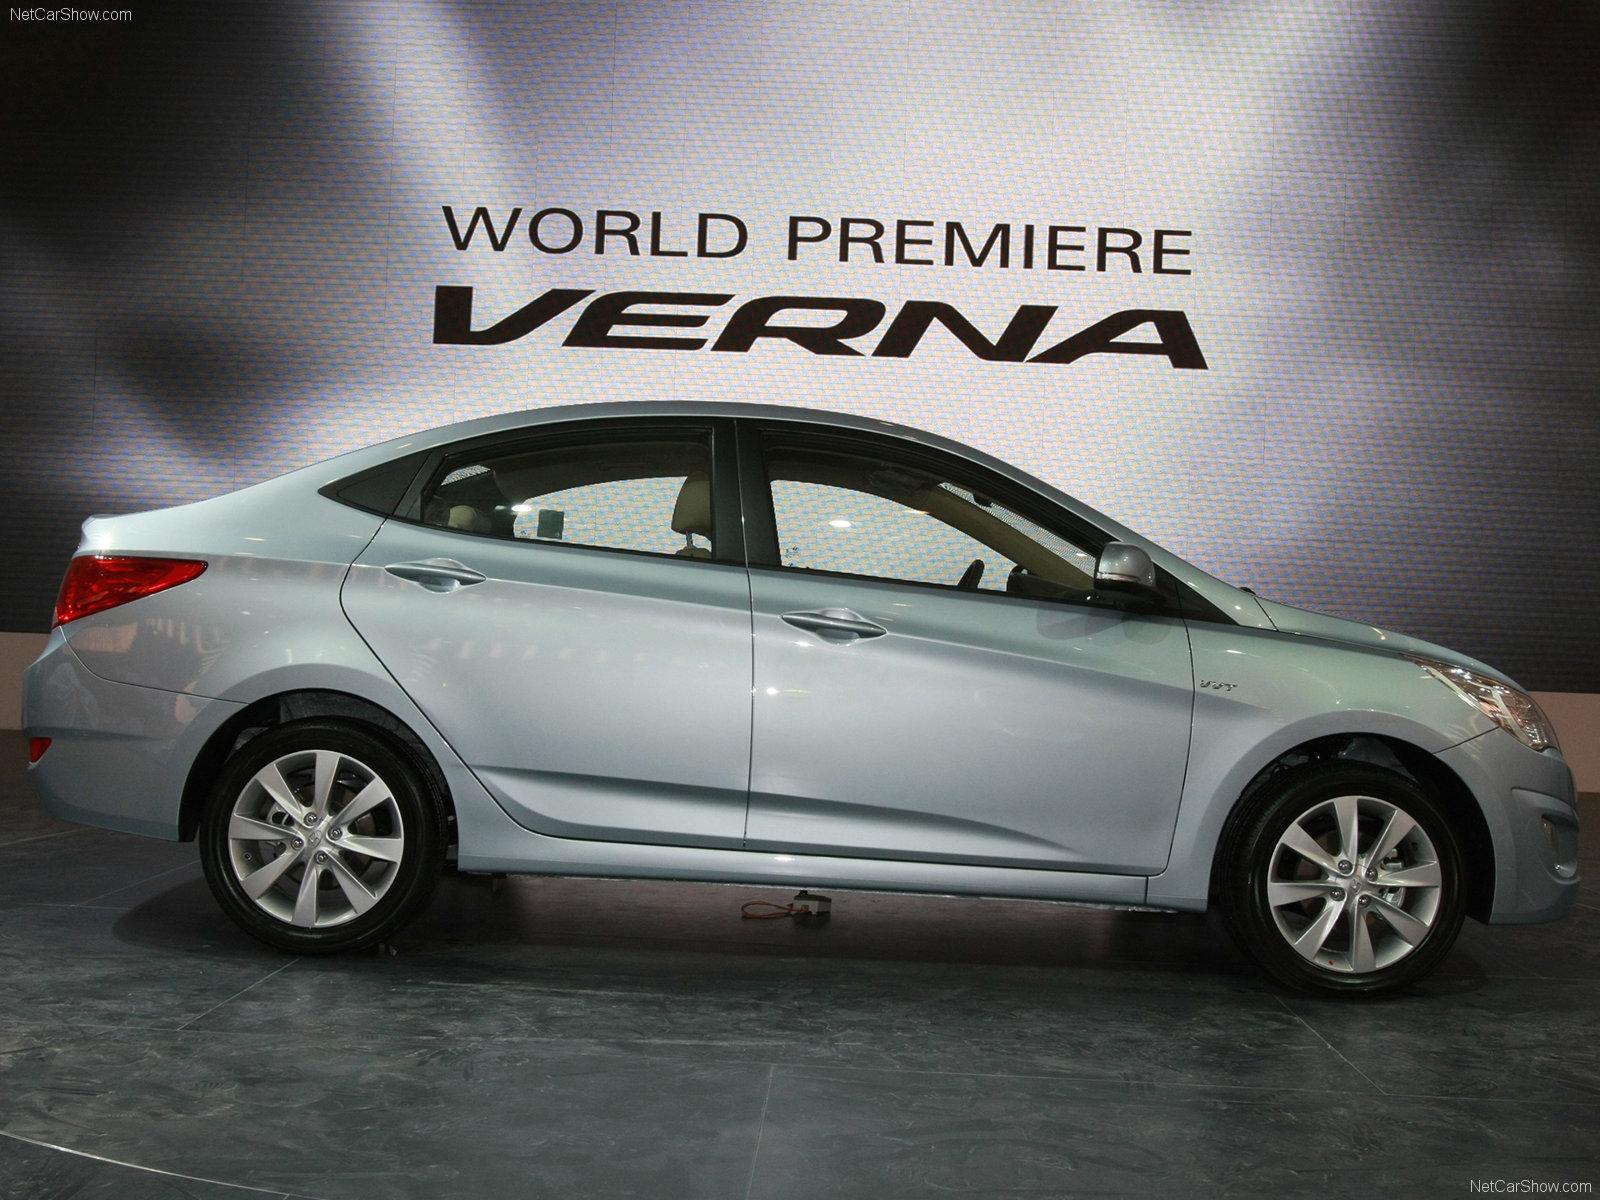 Hyundai Verna Photos Photogallery With 11 Pics Carsbase Com